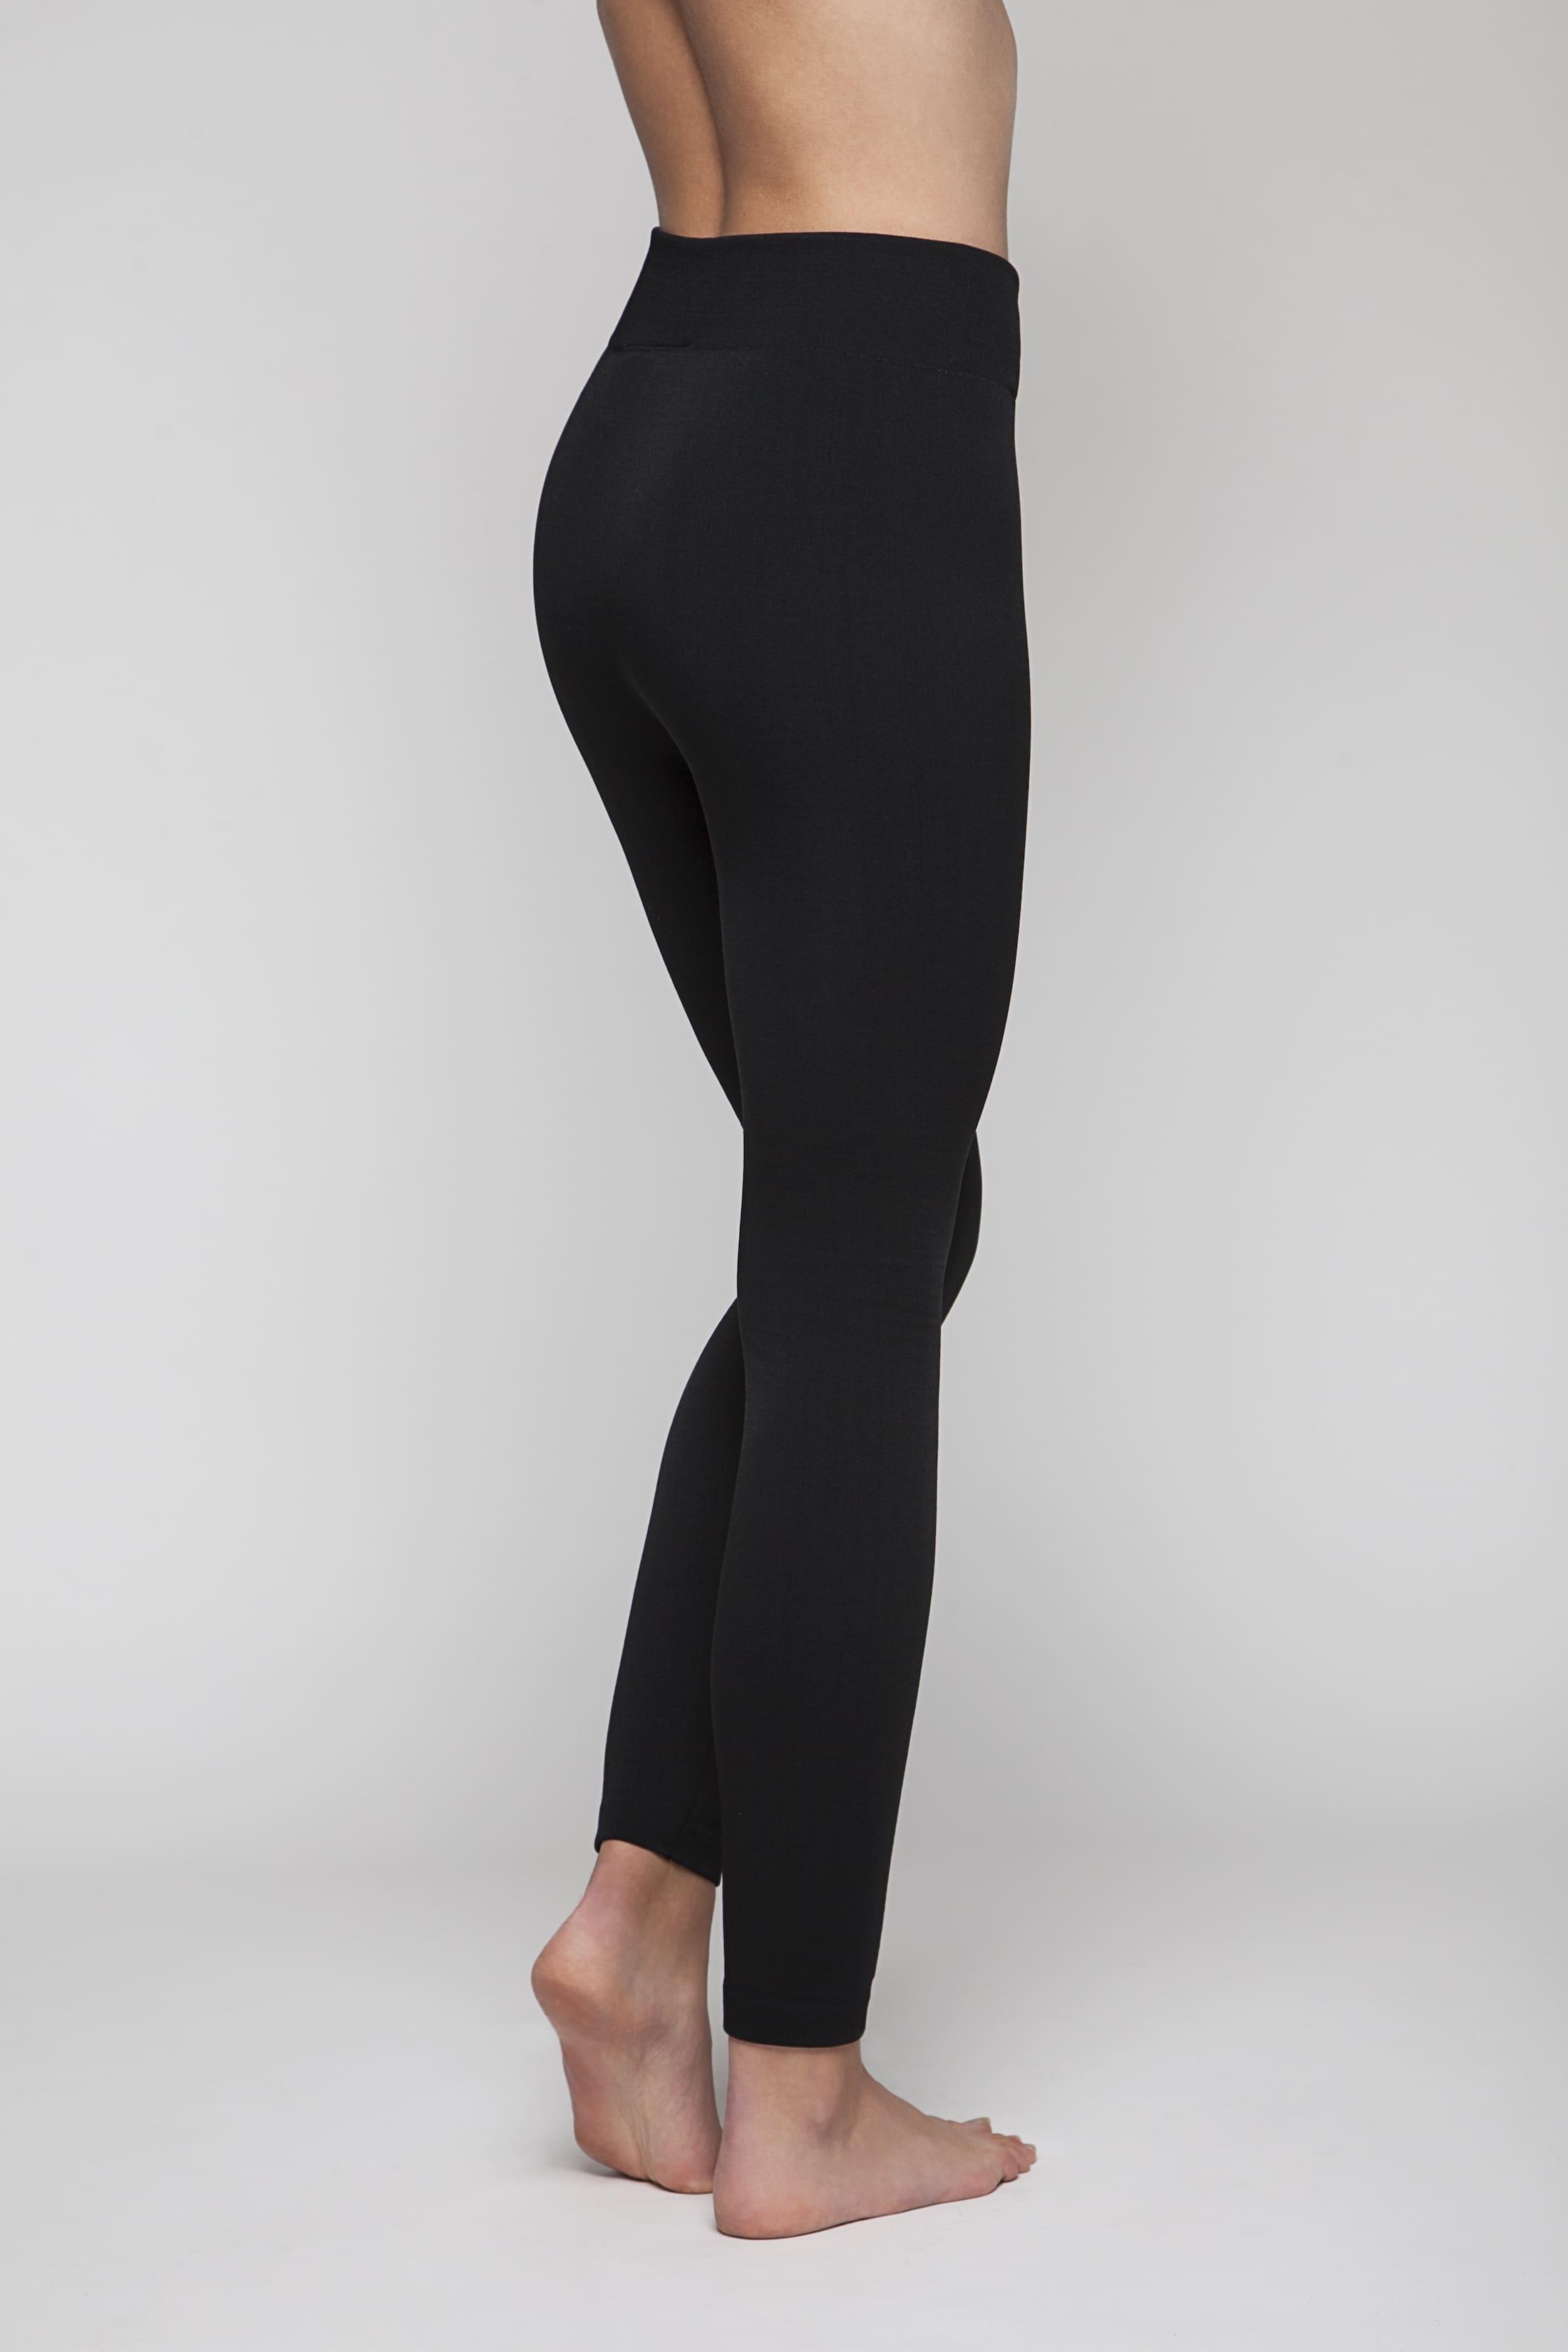 Black super-soft comfortable leggings